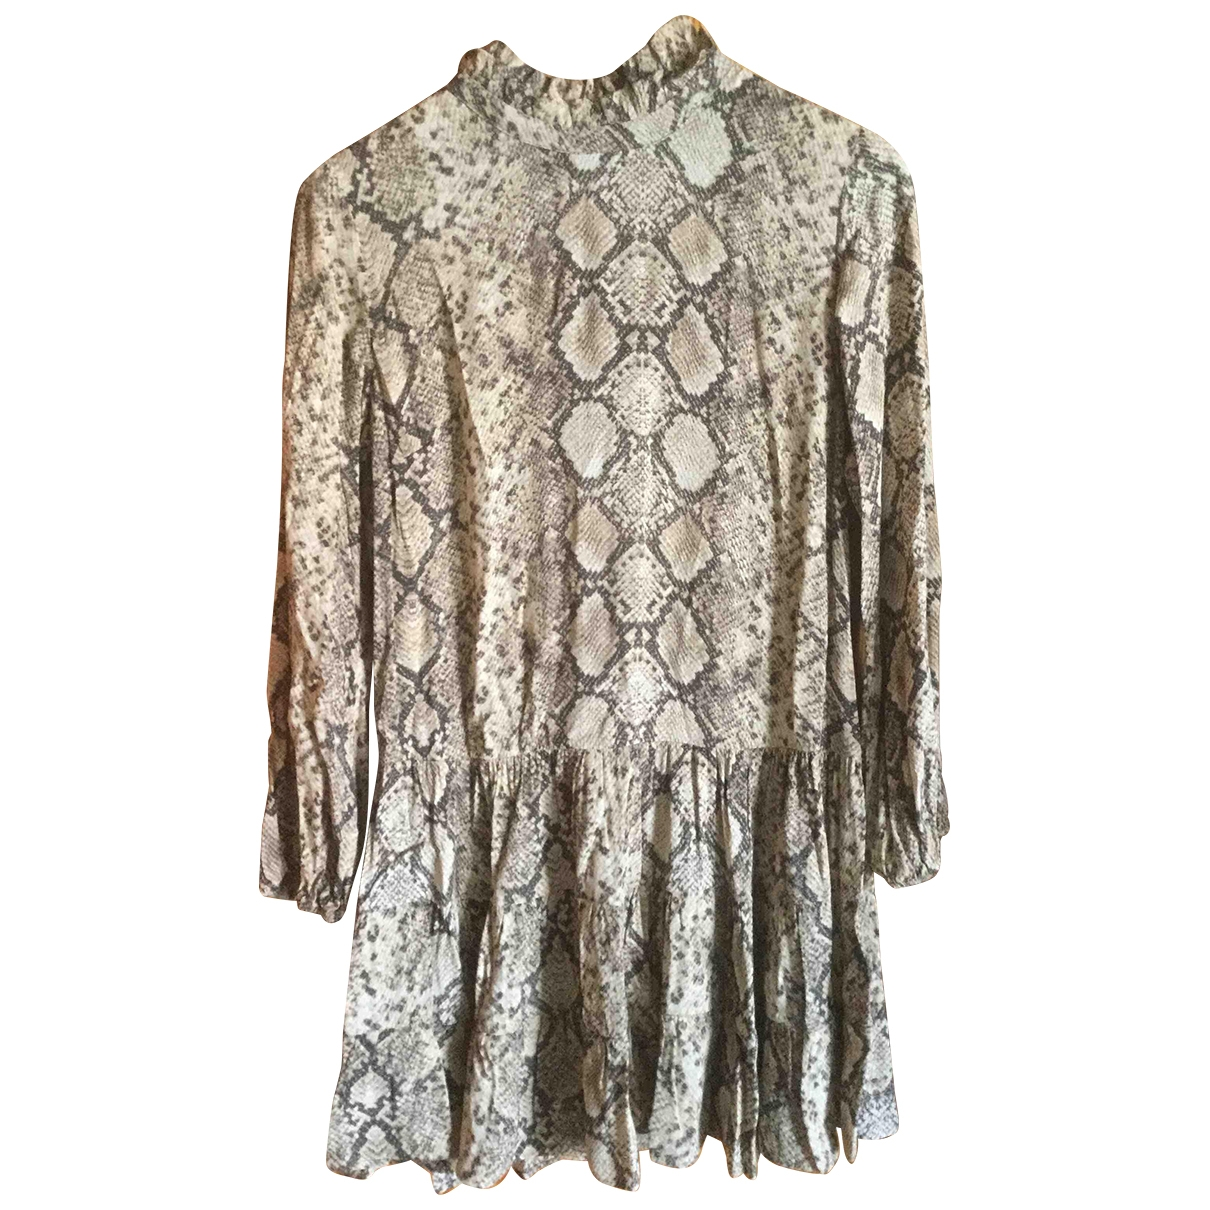 Zara \N Kleid in  Beige Synthetik